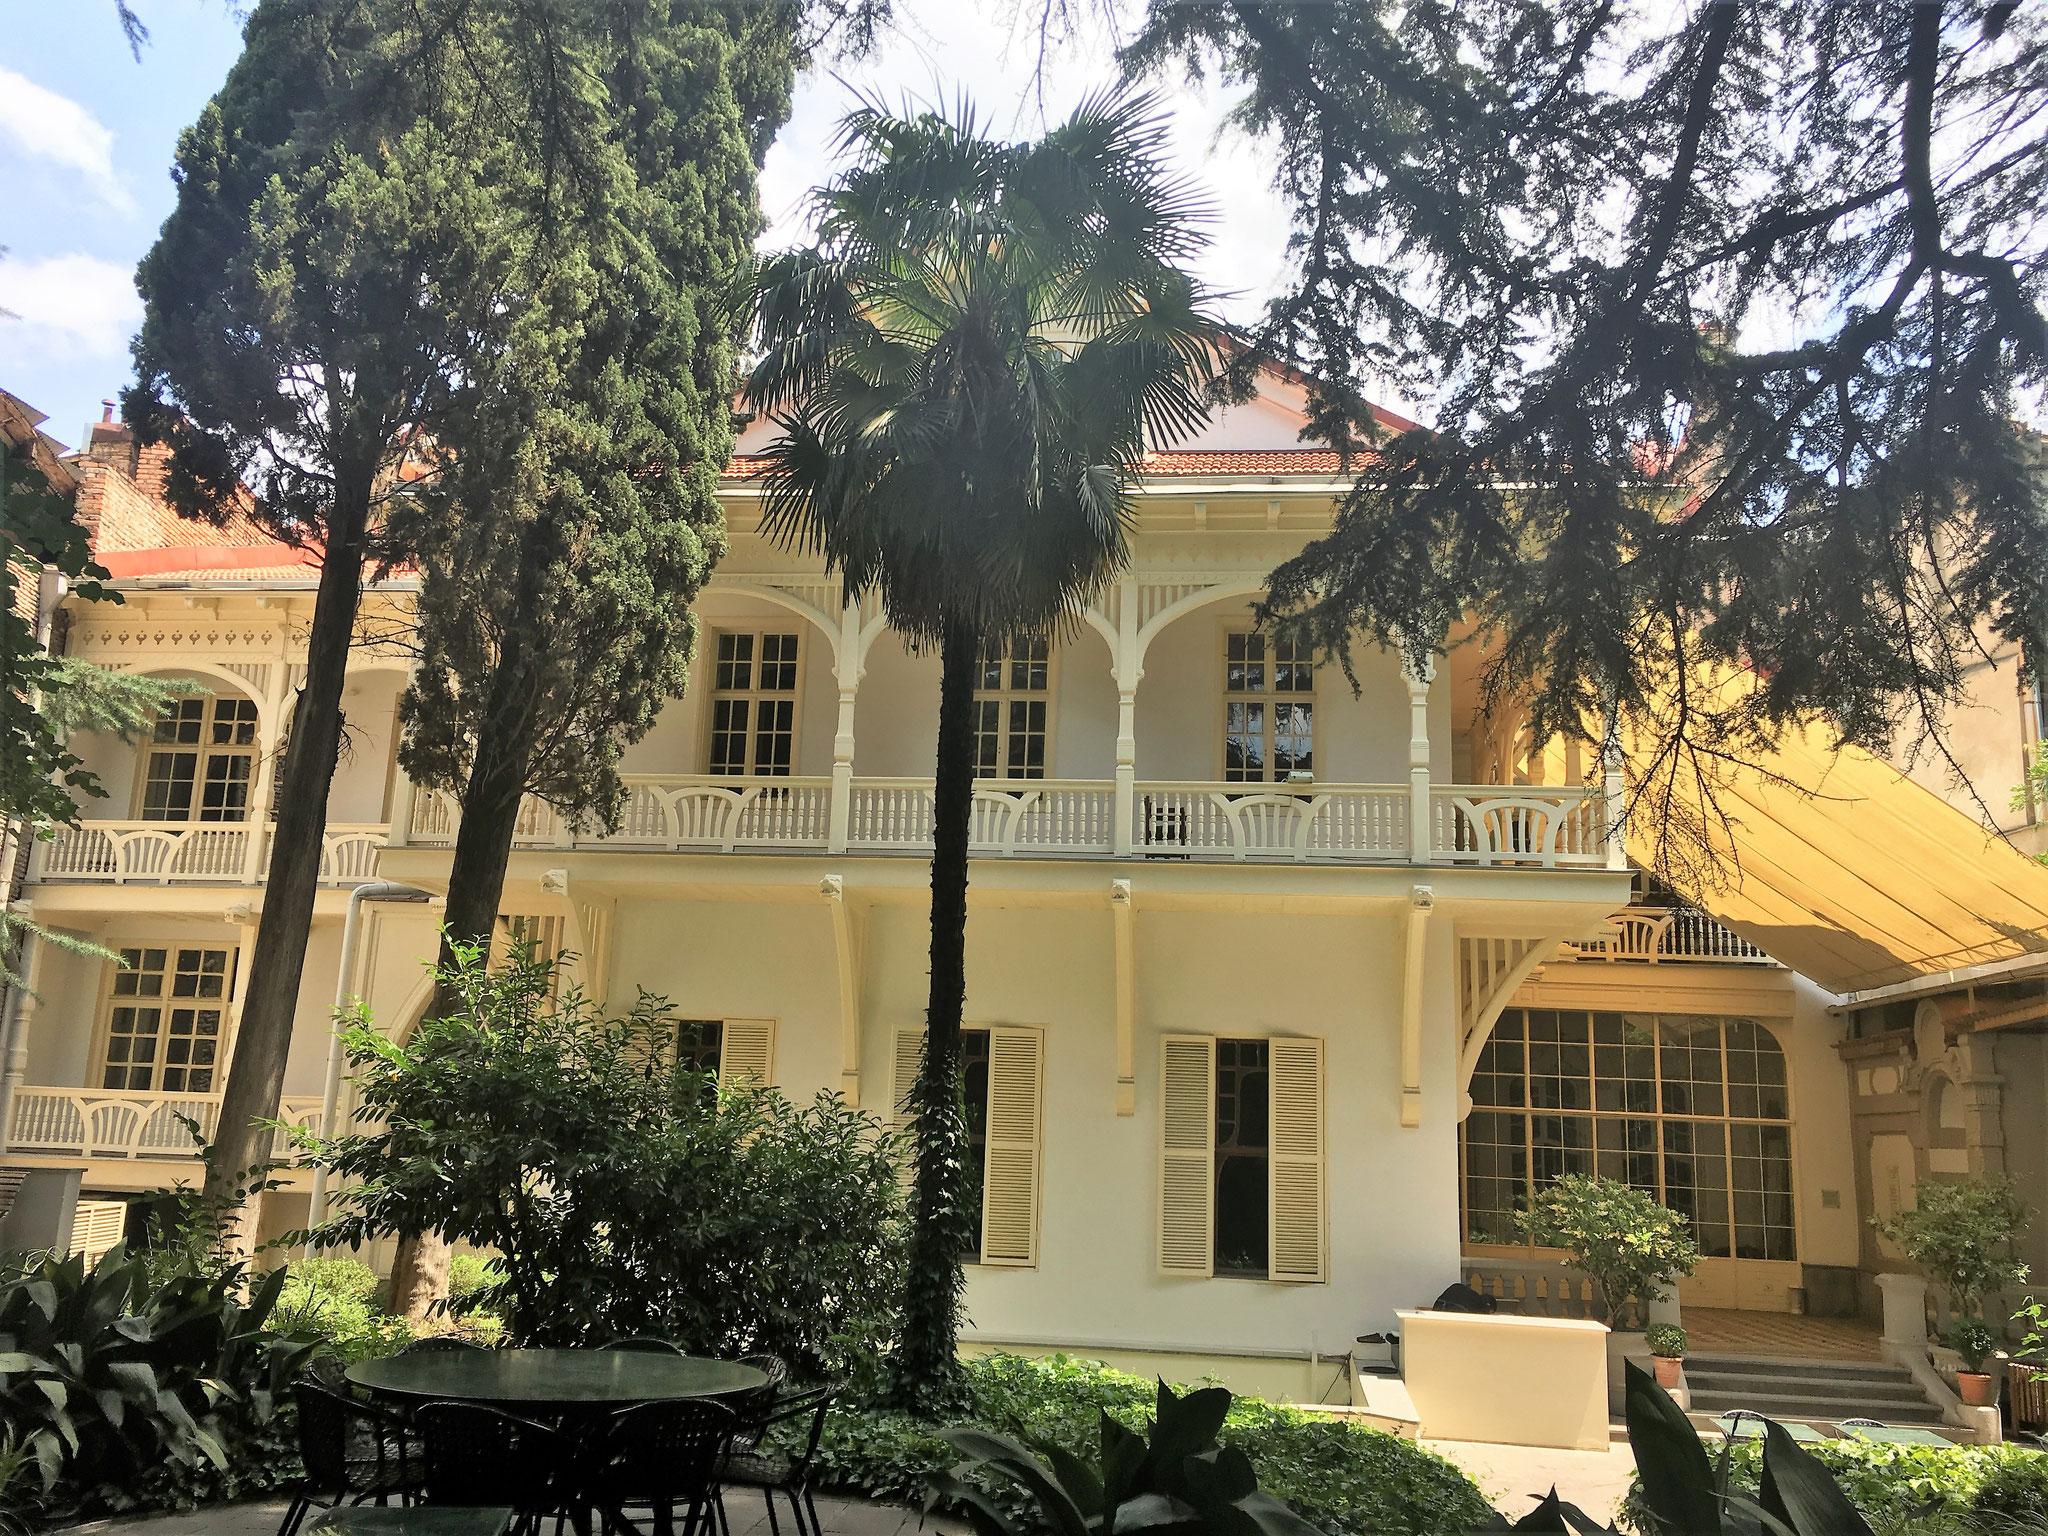 Cafe Literal in Tiflis